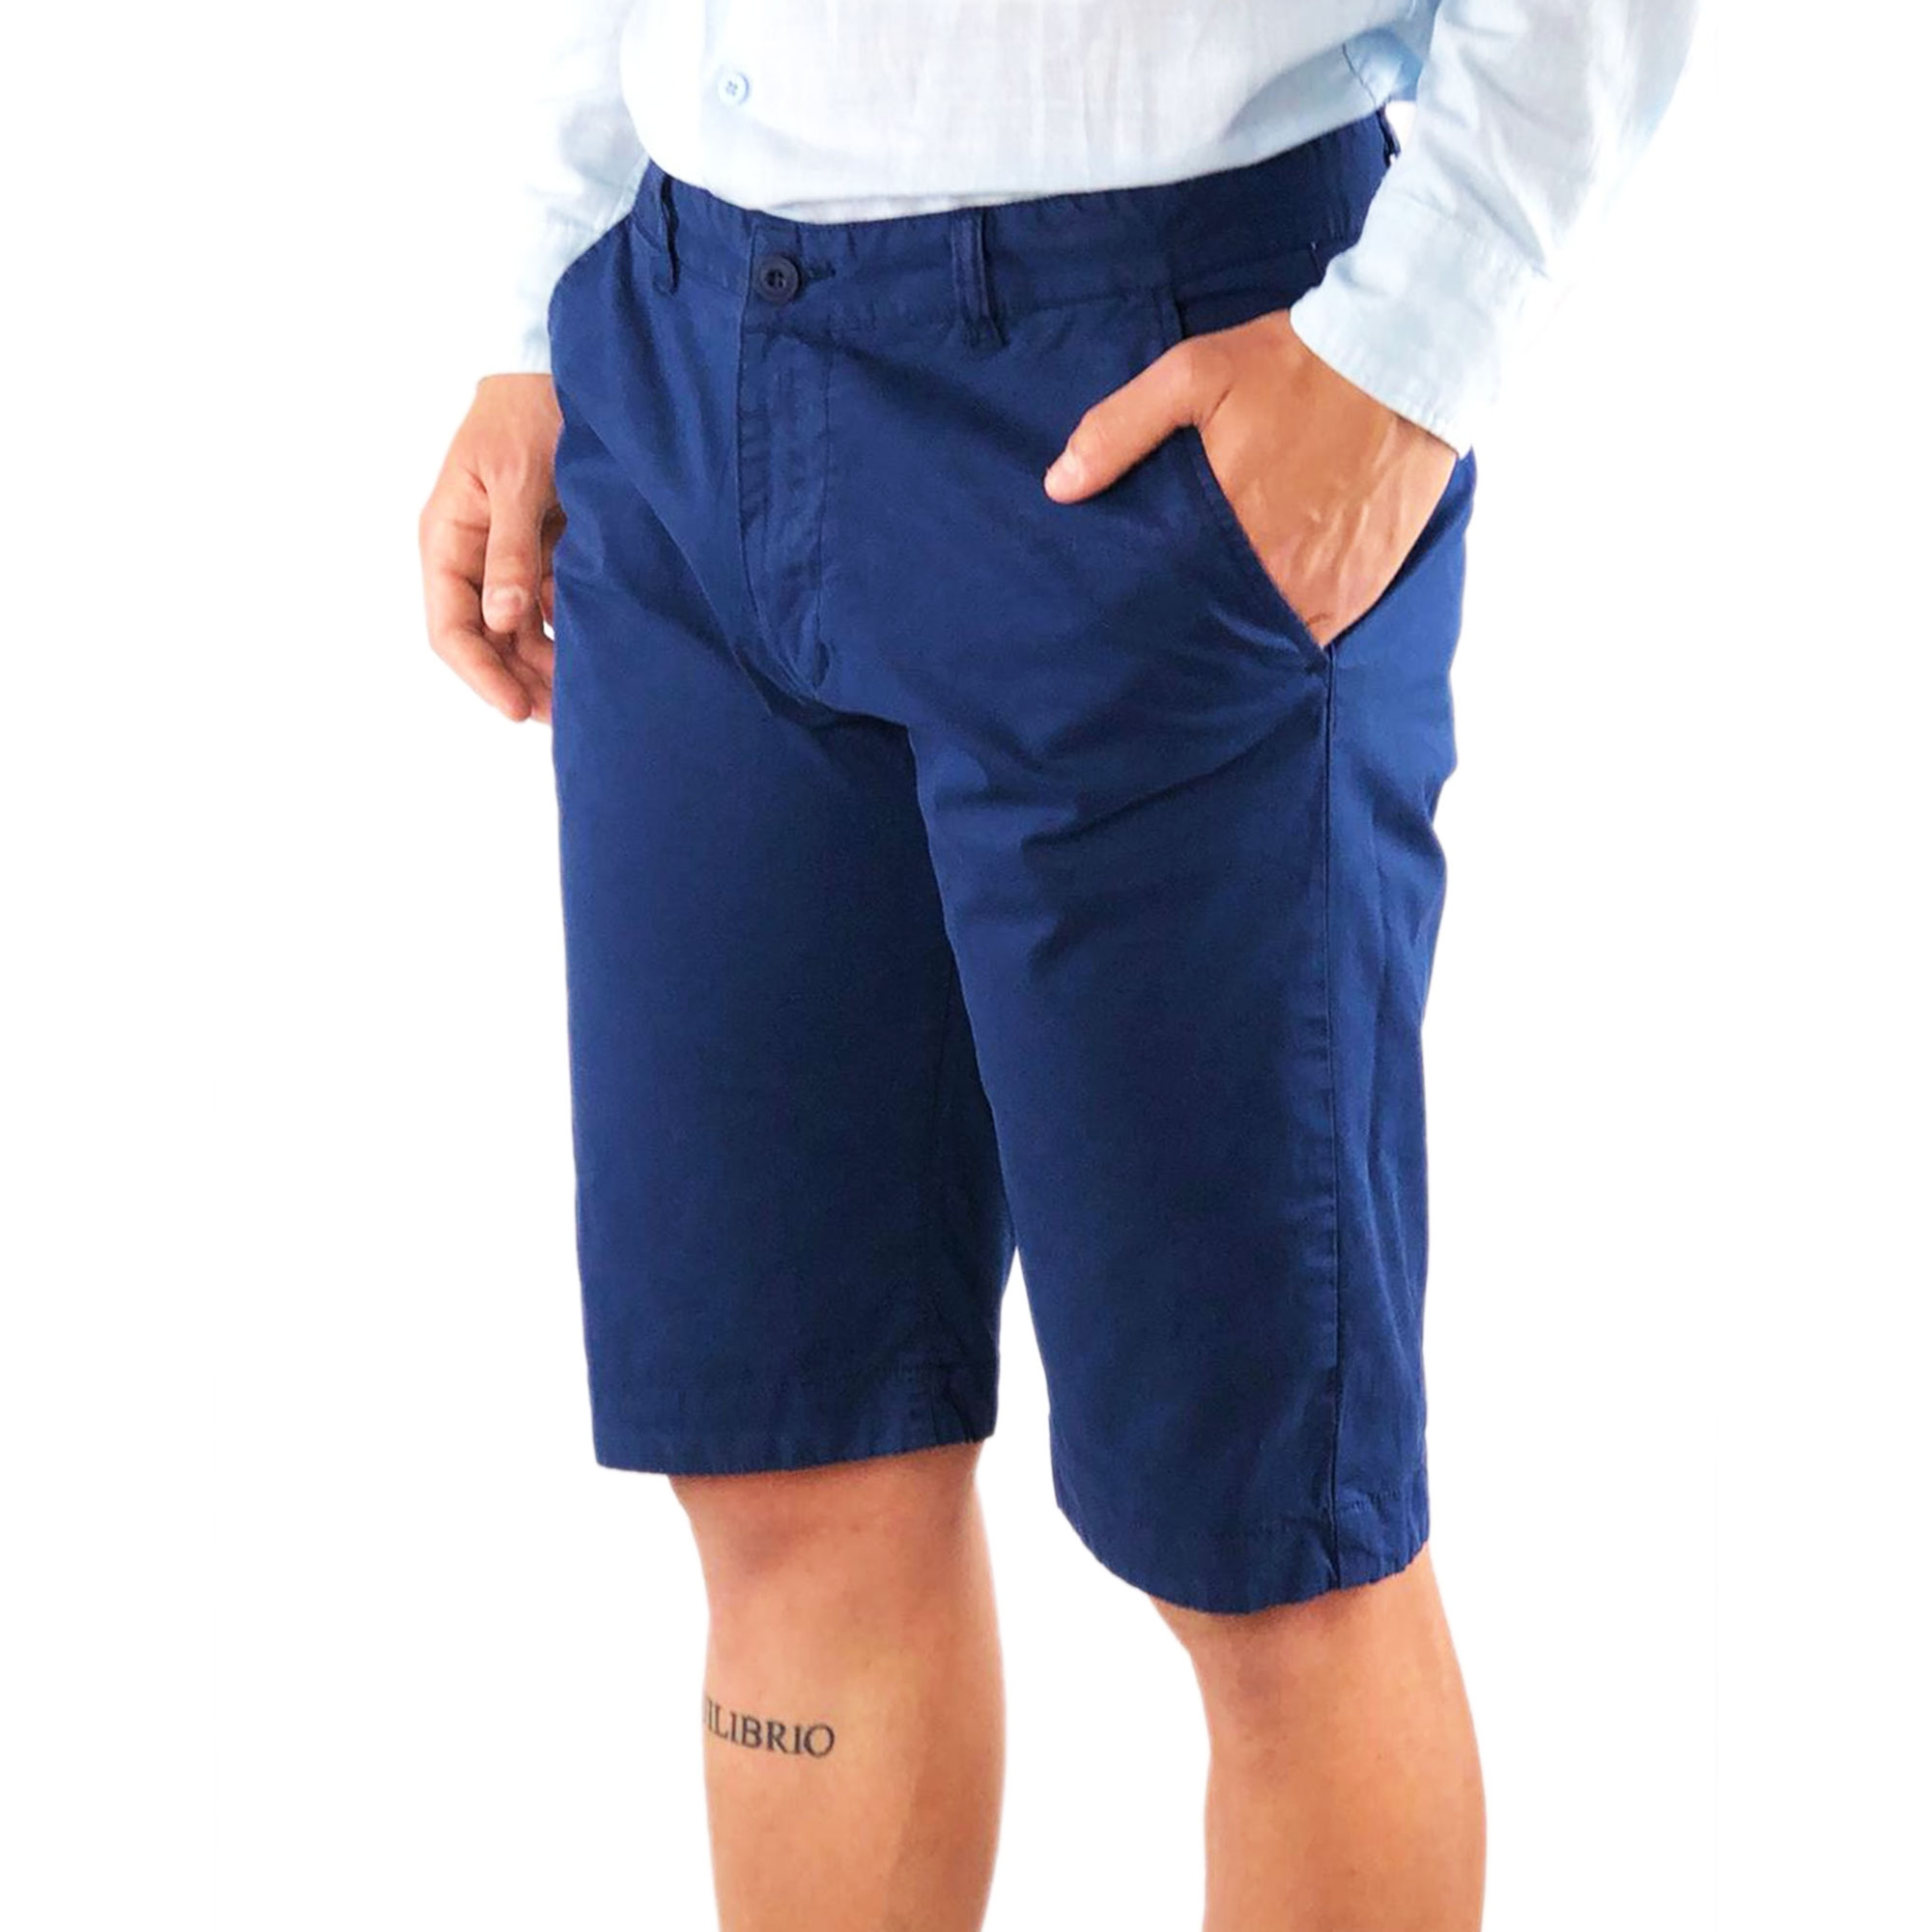 Bermuda-Uomo-Cotone-Slim-Fit-Jeans-Pantalone-Corto-Shorts-Pantaloncini-Casual miniatura 14